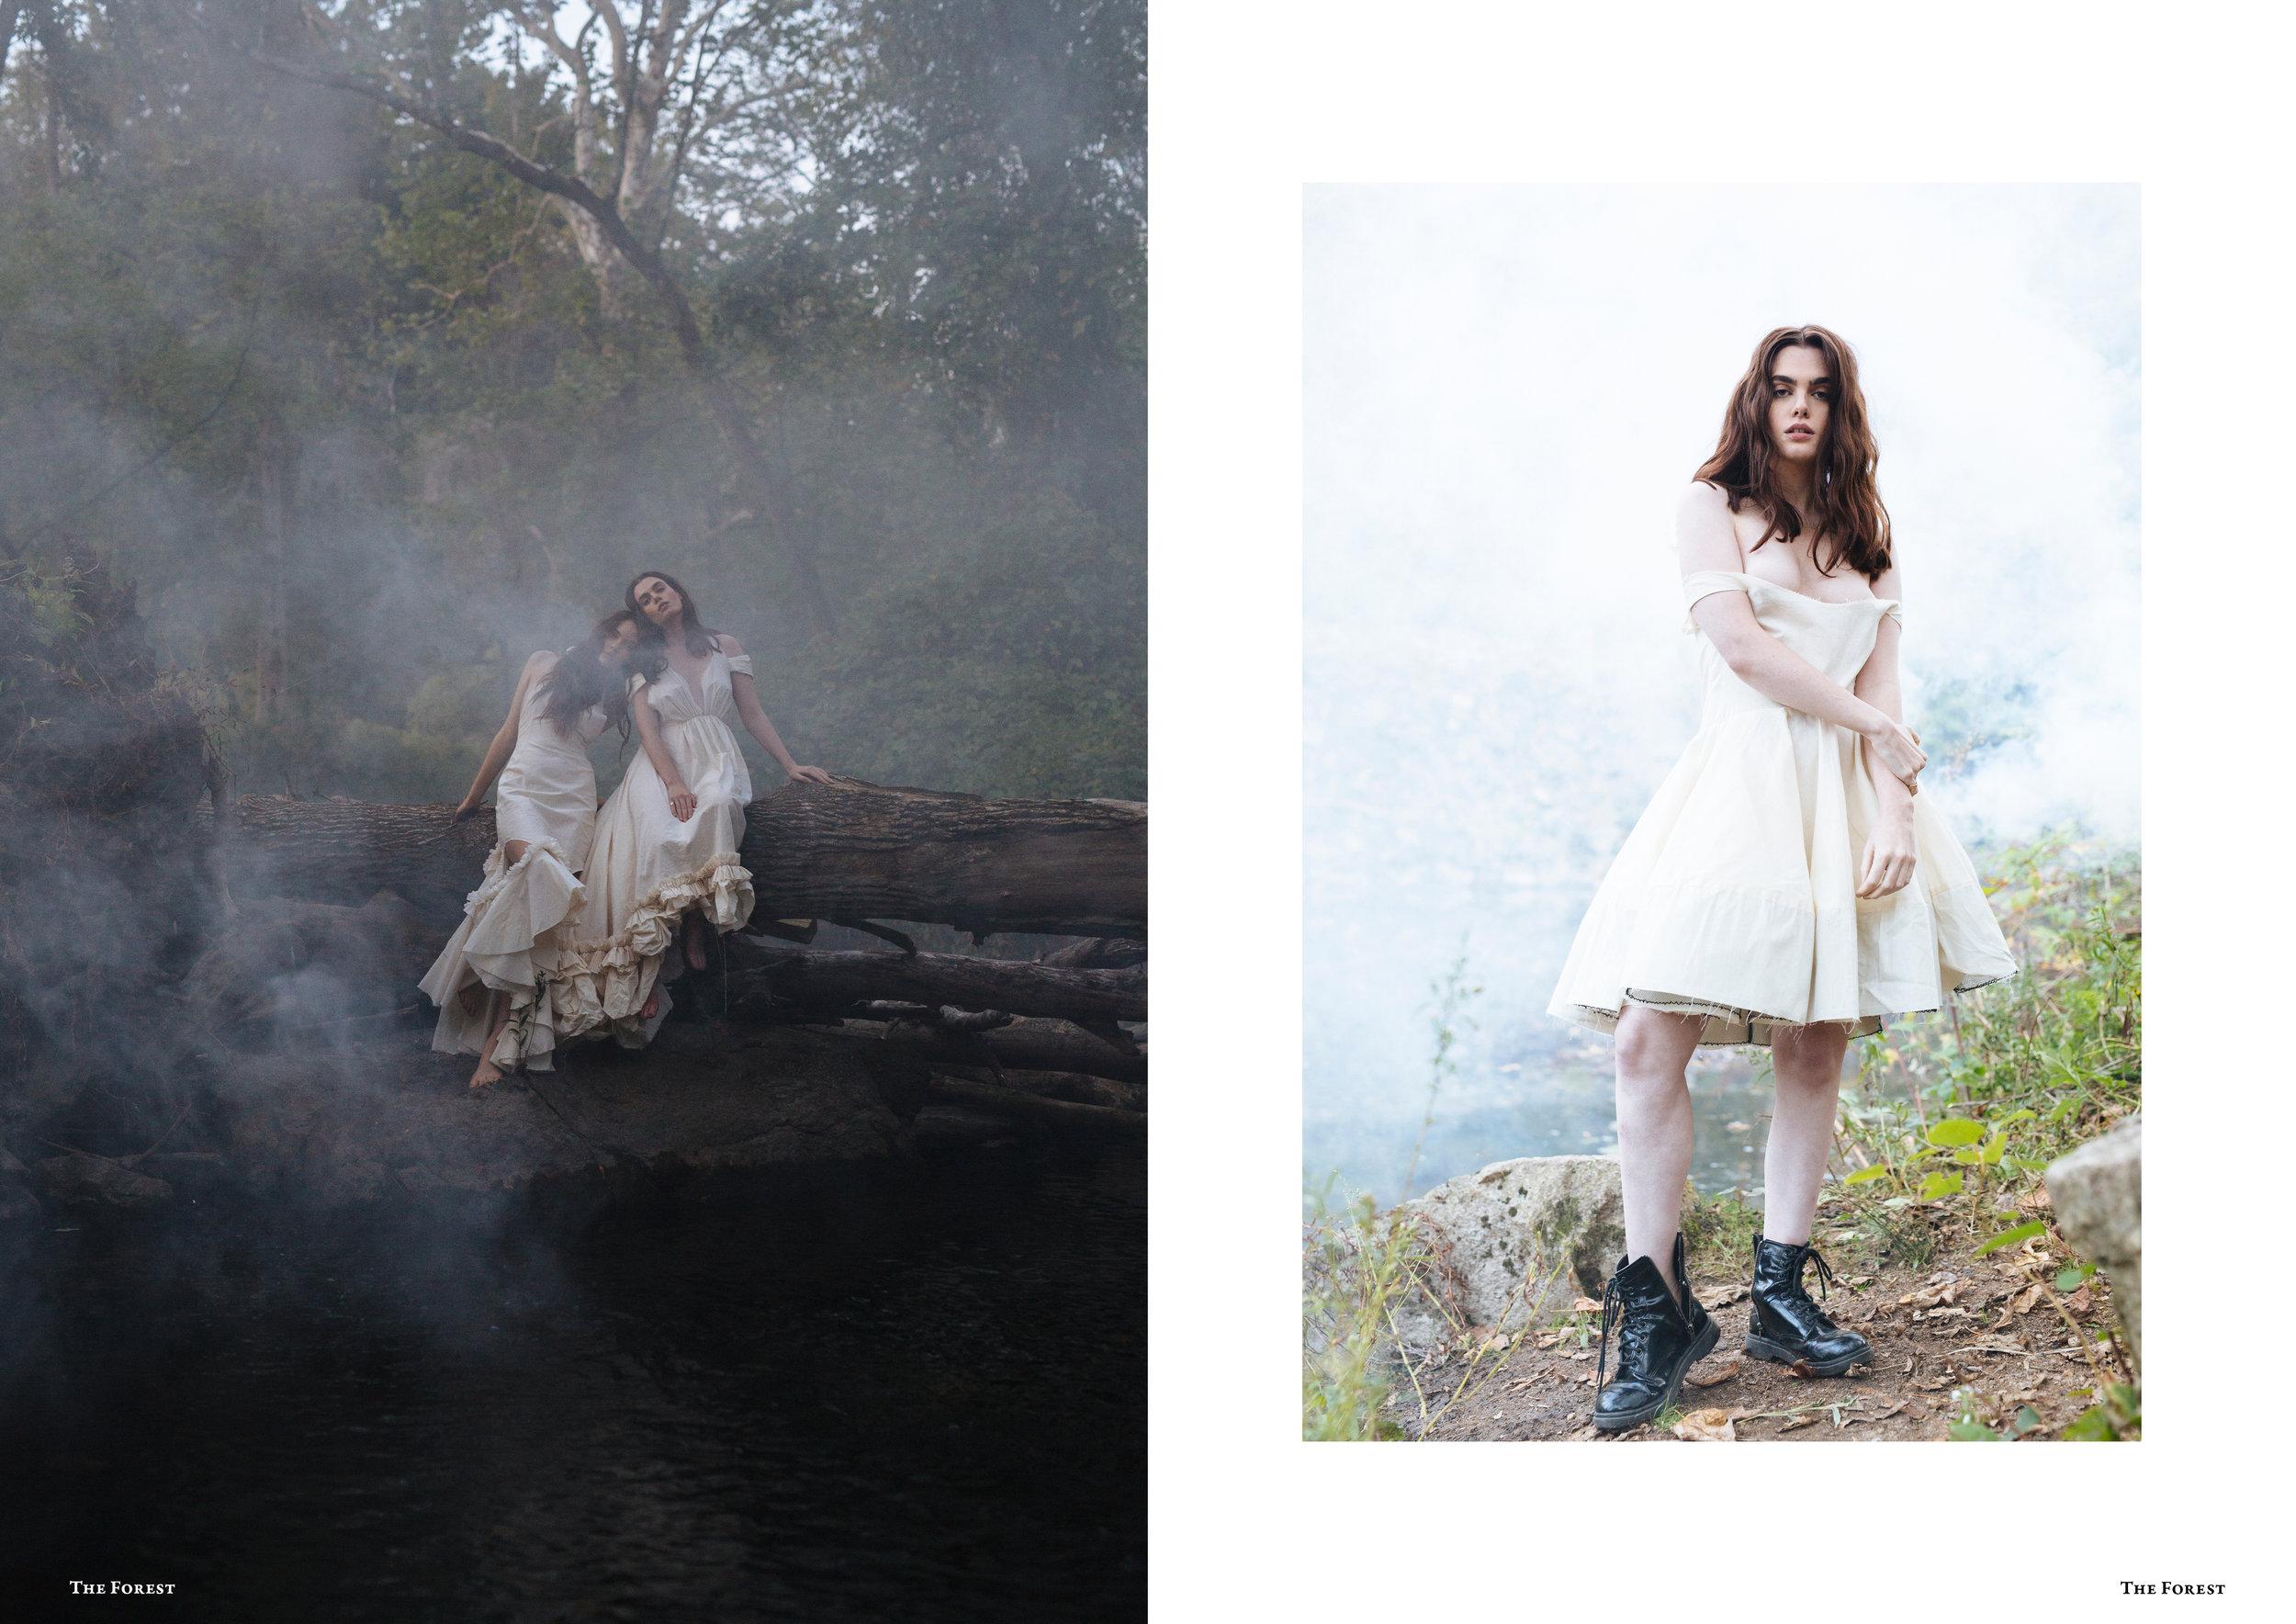 kelsey randall bespoke muslin collection the forest magazine spencer ostrander charlie howard lucia roberts